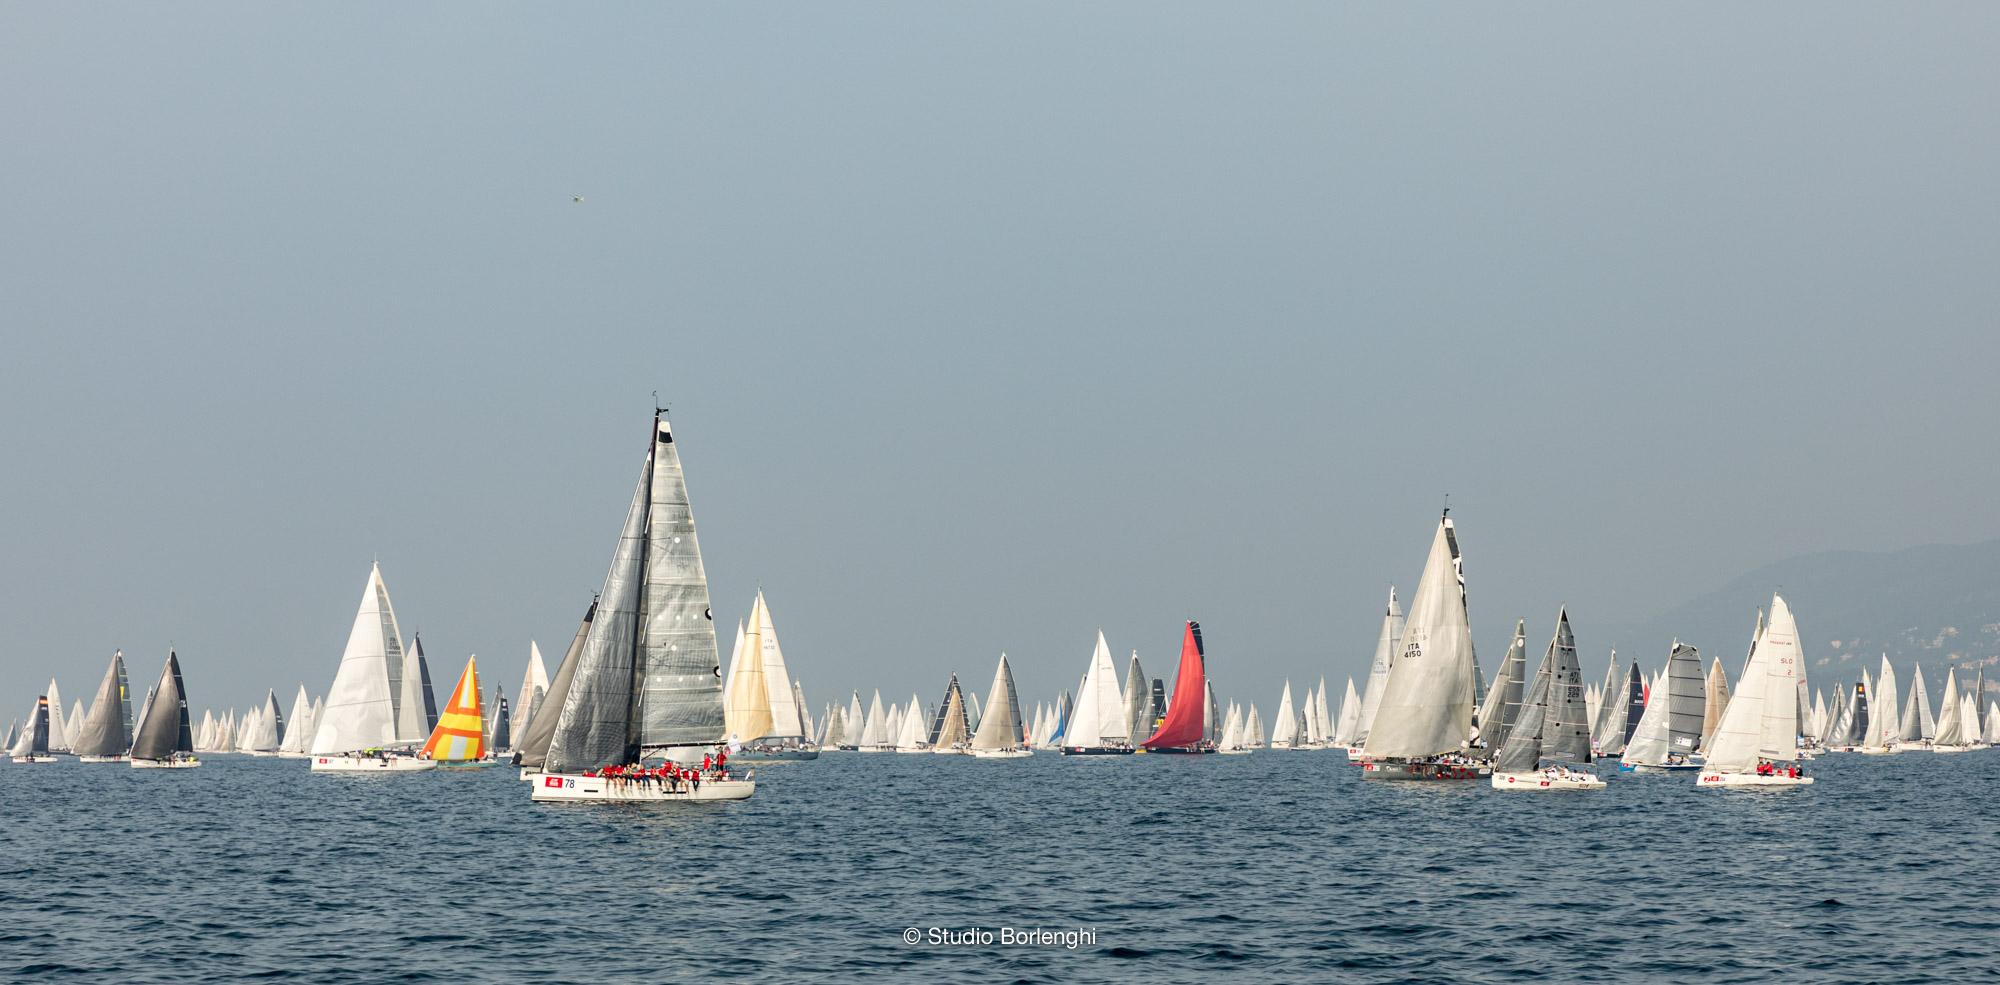 Barcolana barche a vela regata Trieste Barcola